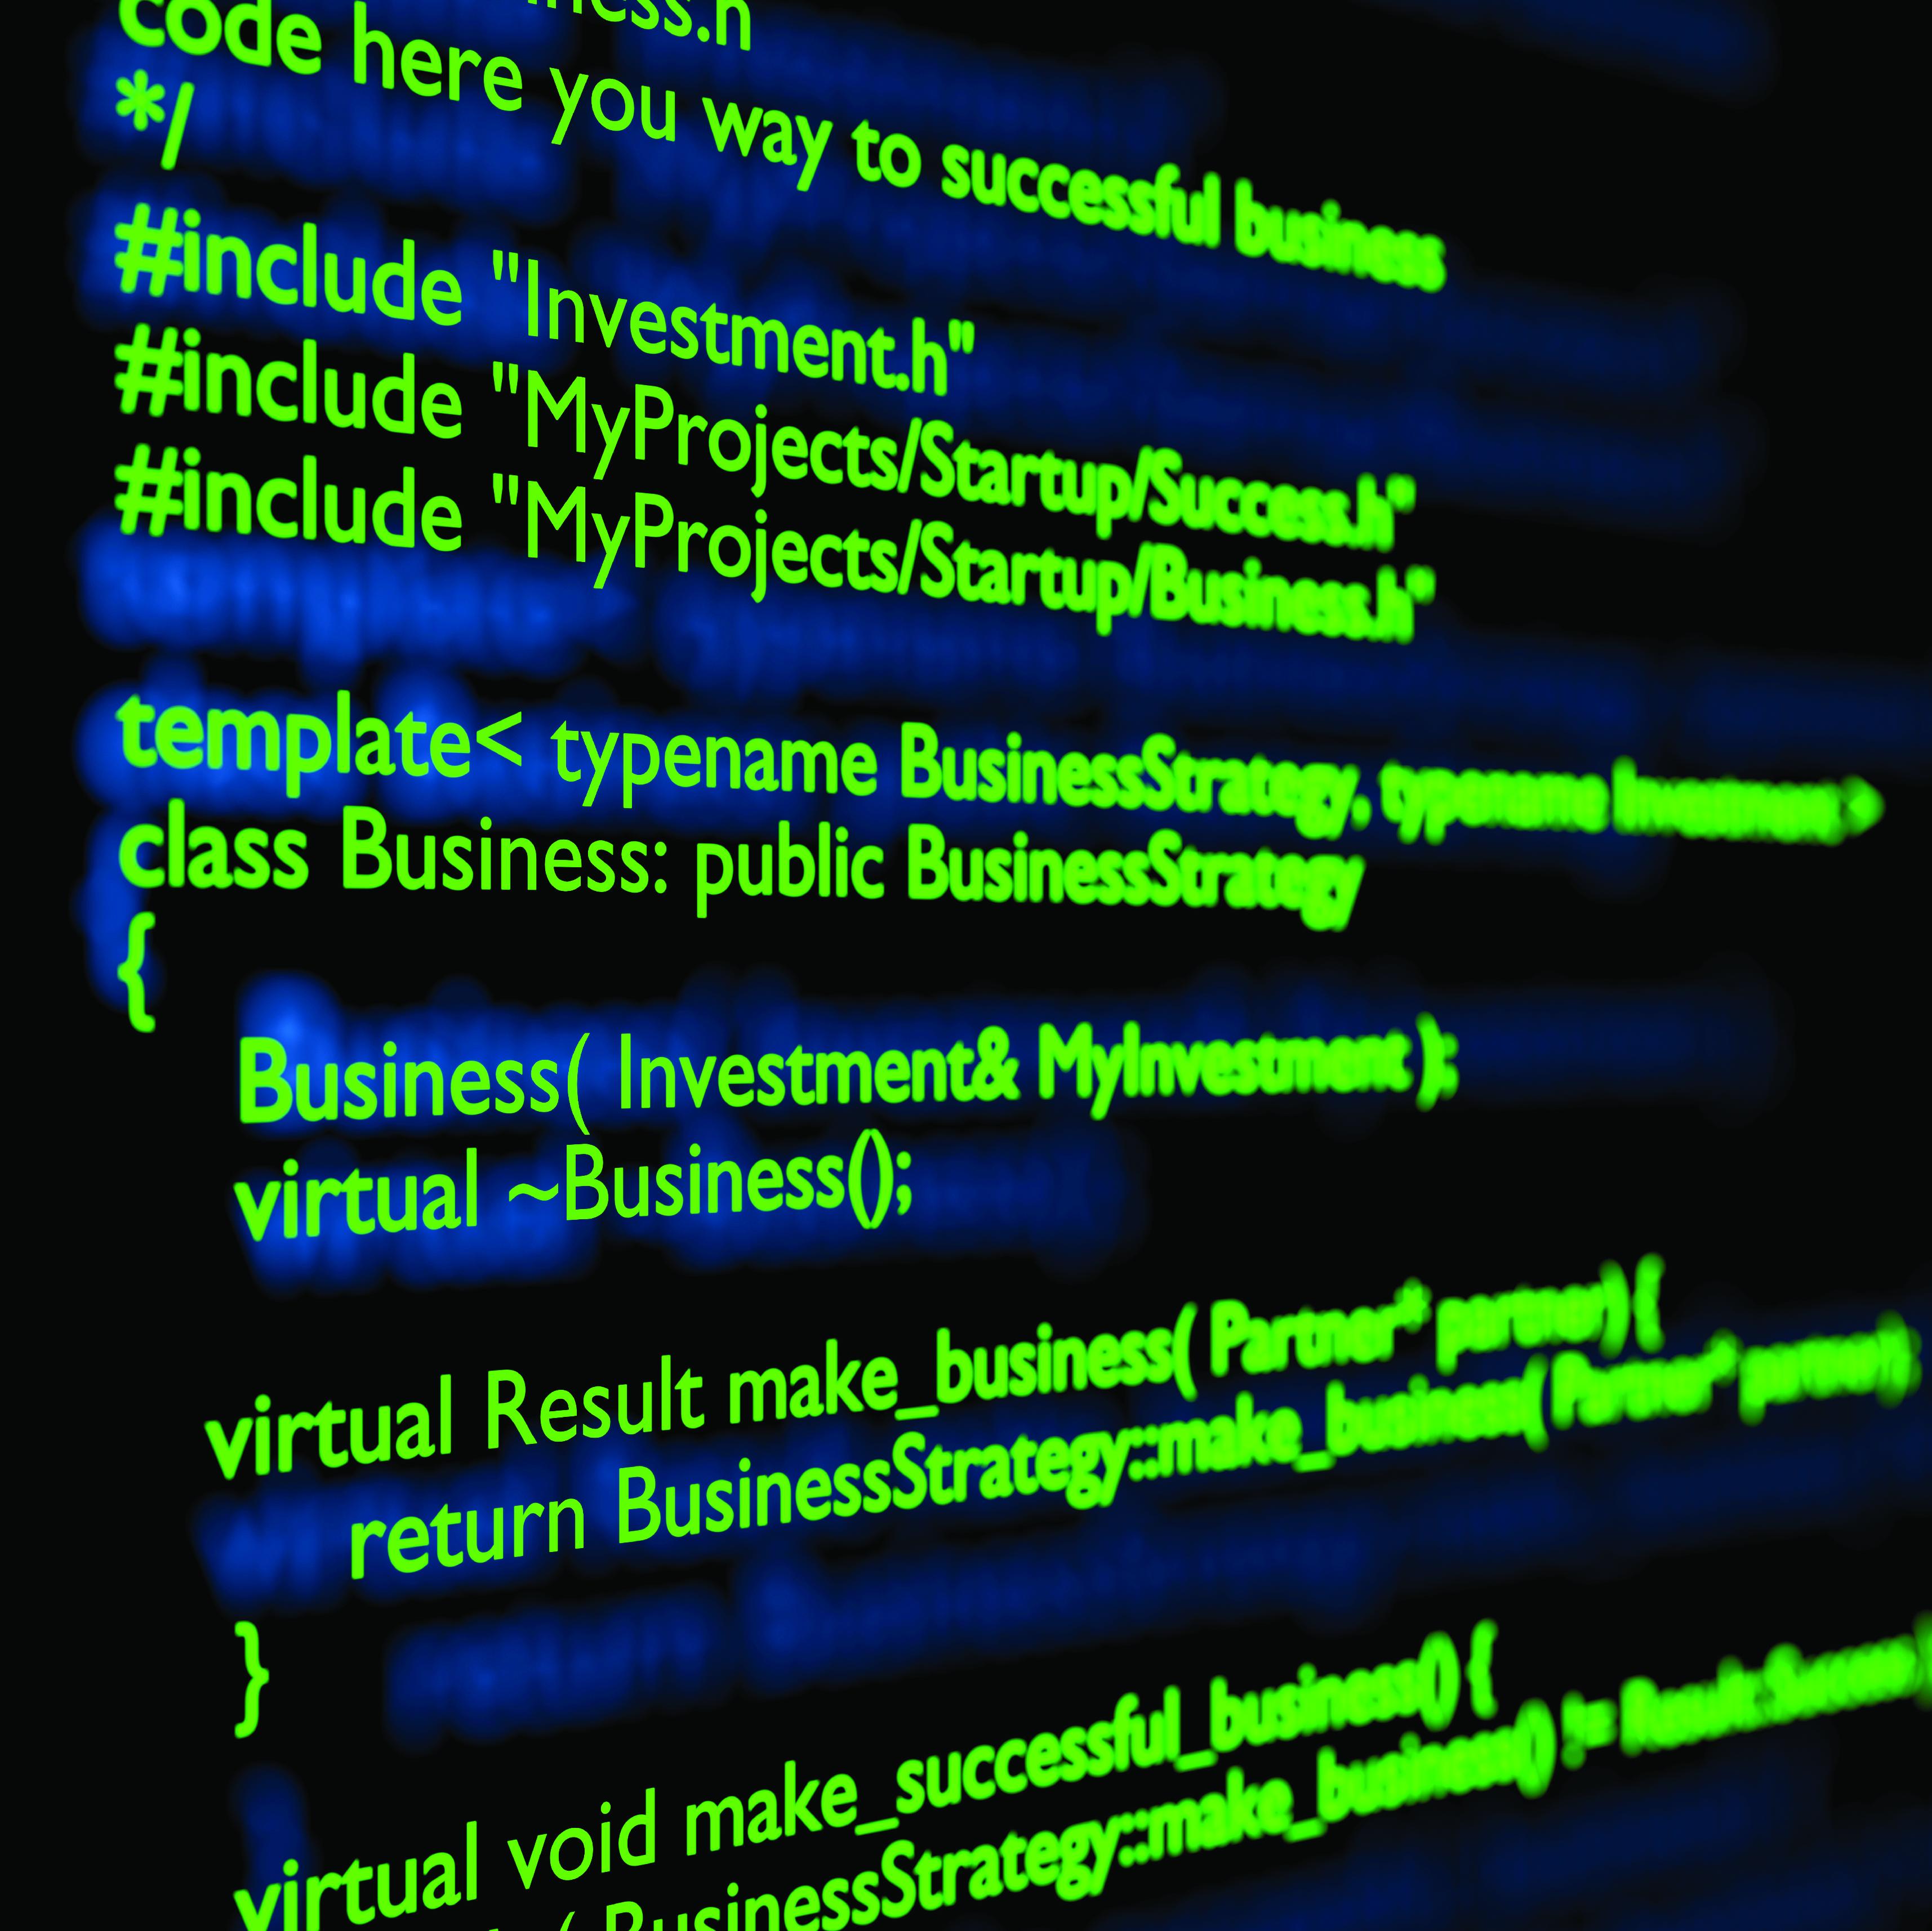 Empresas de software crean alianza para favorecer pymes